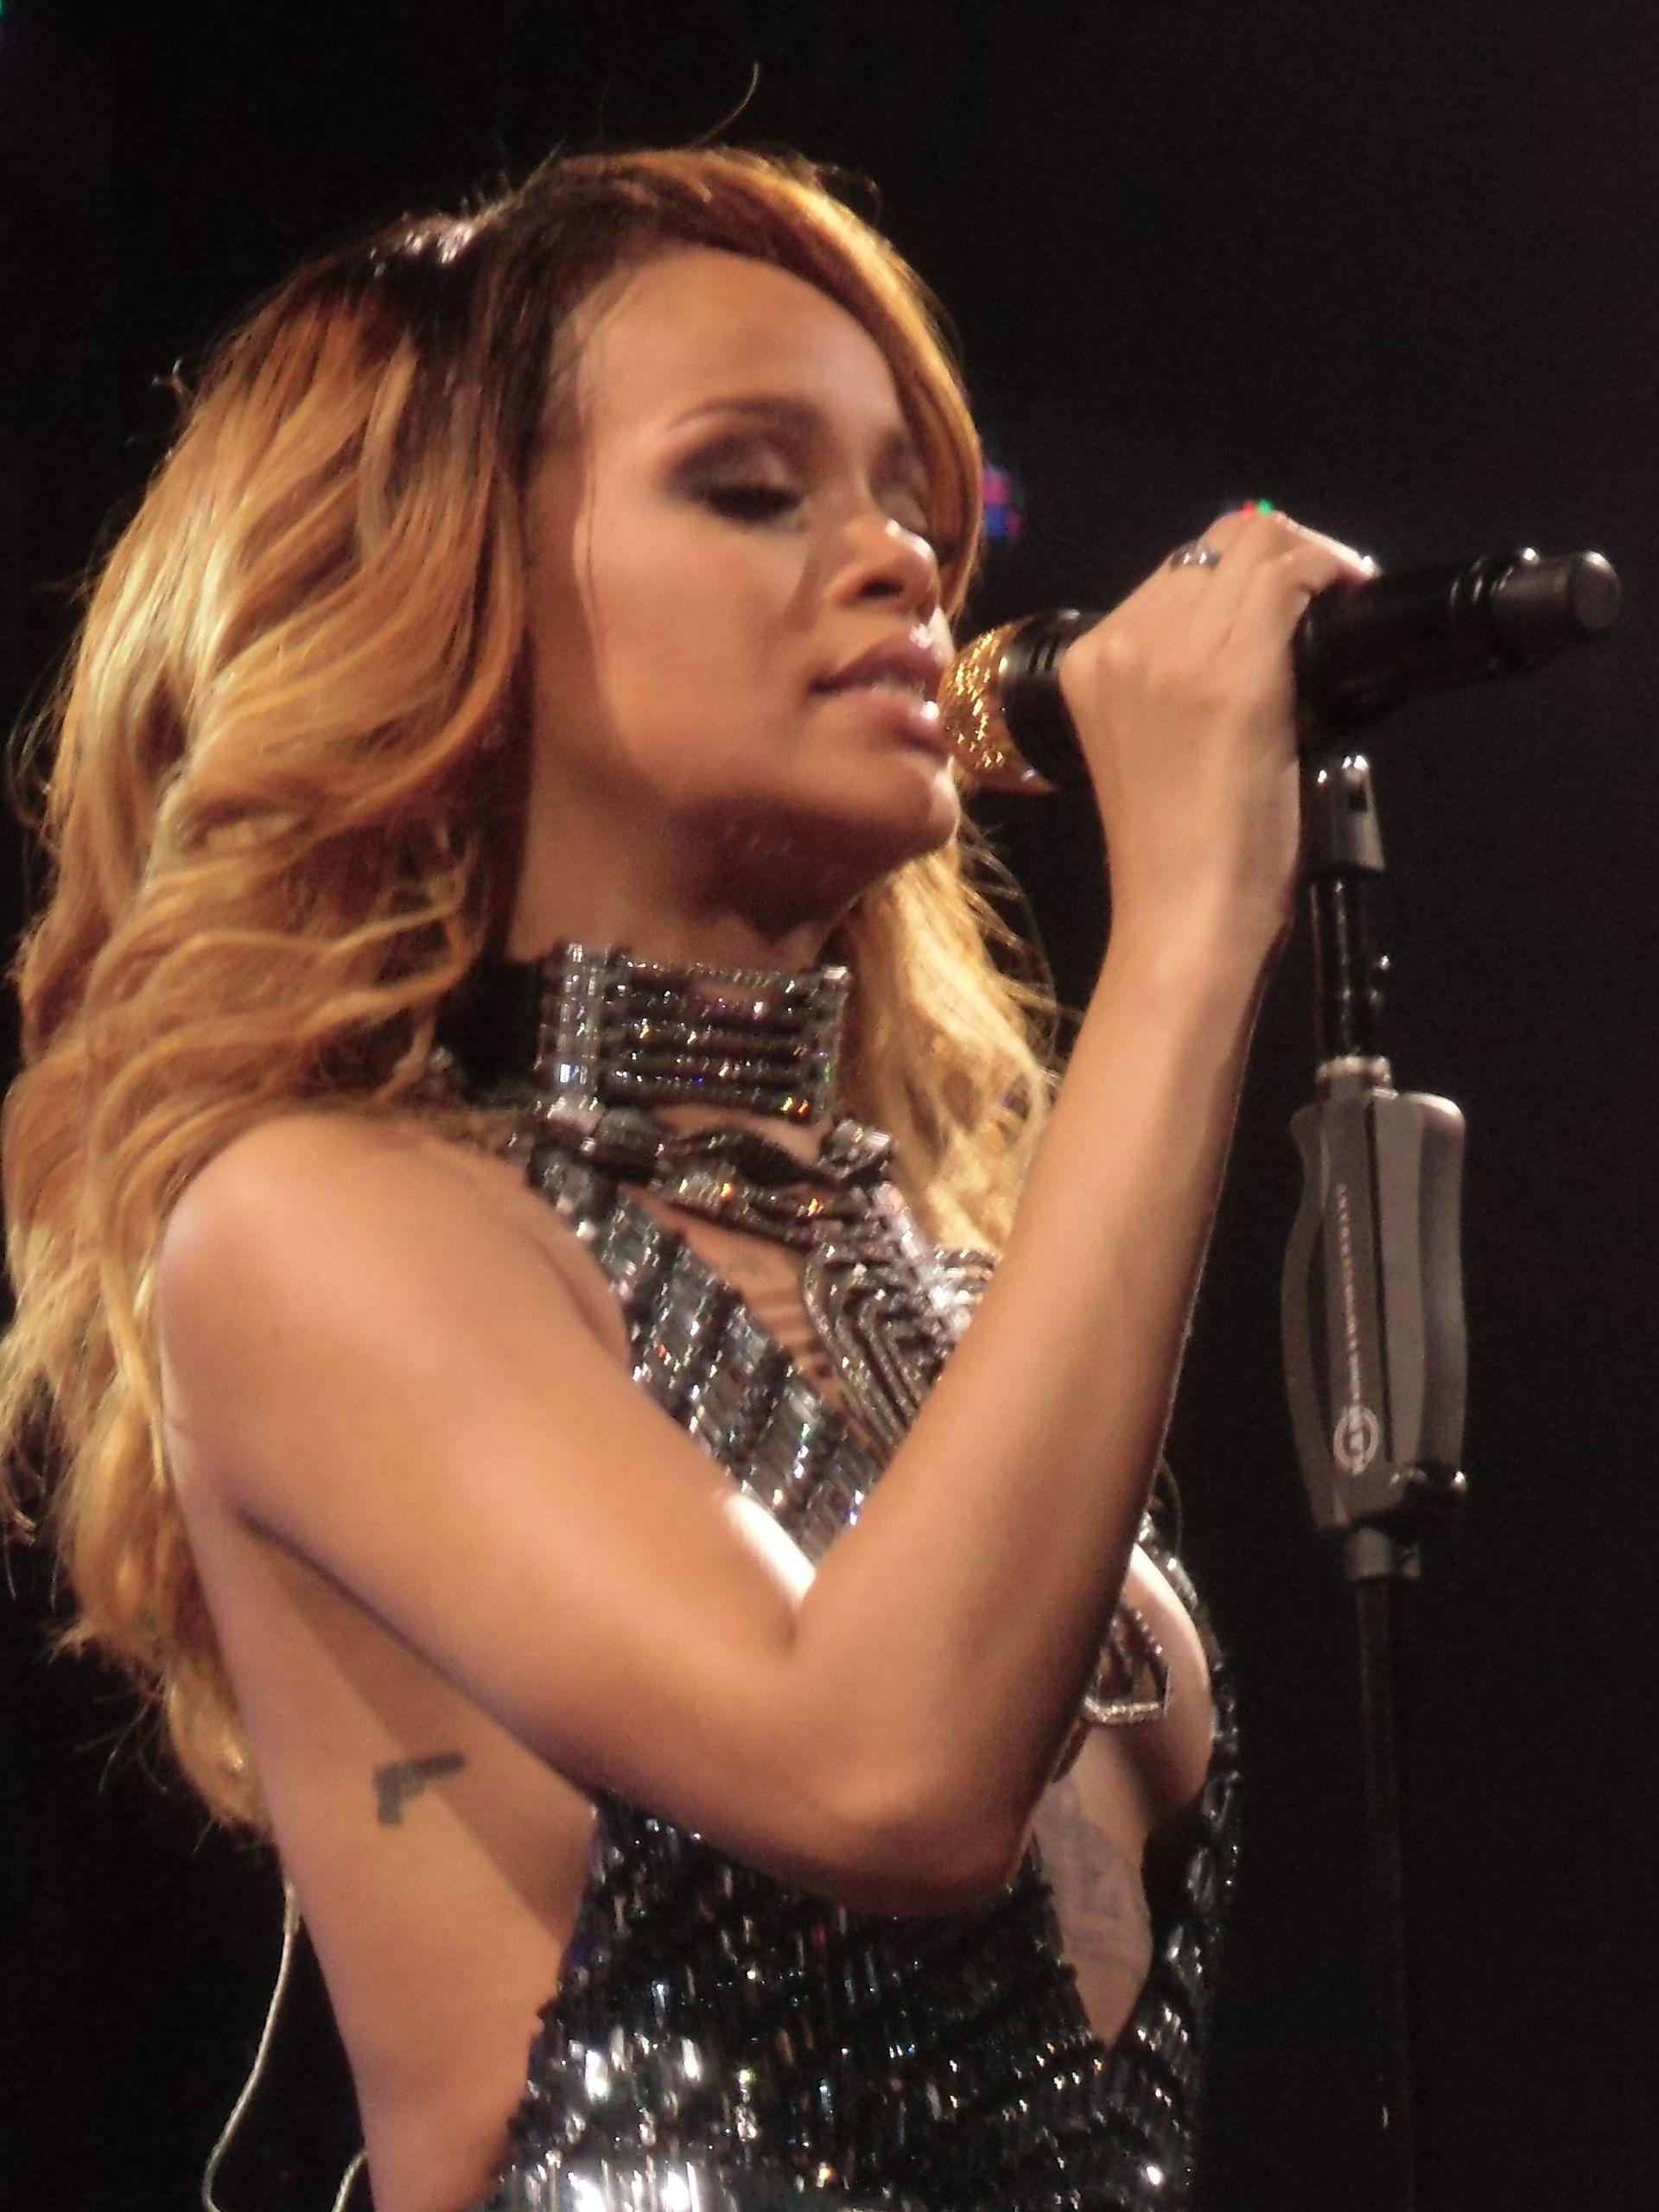 Rihanna 2013: Out in London-08 – GotCeleb |Rihanna 2013